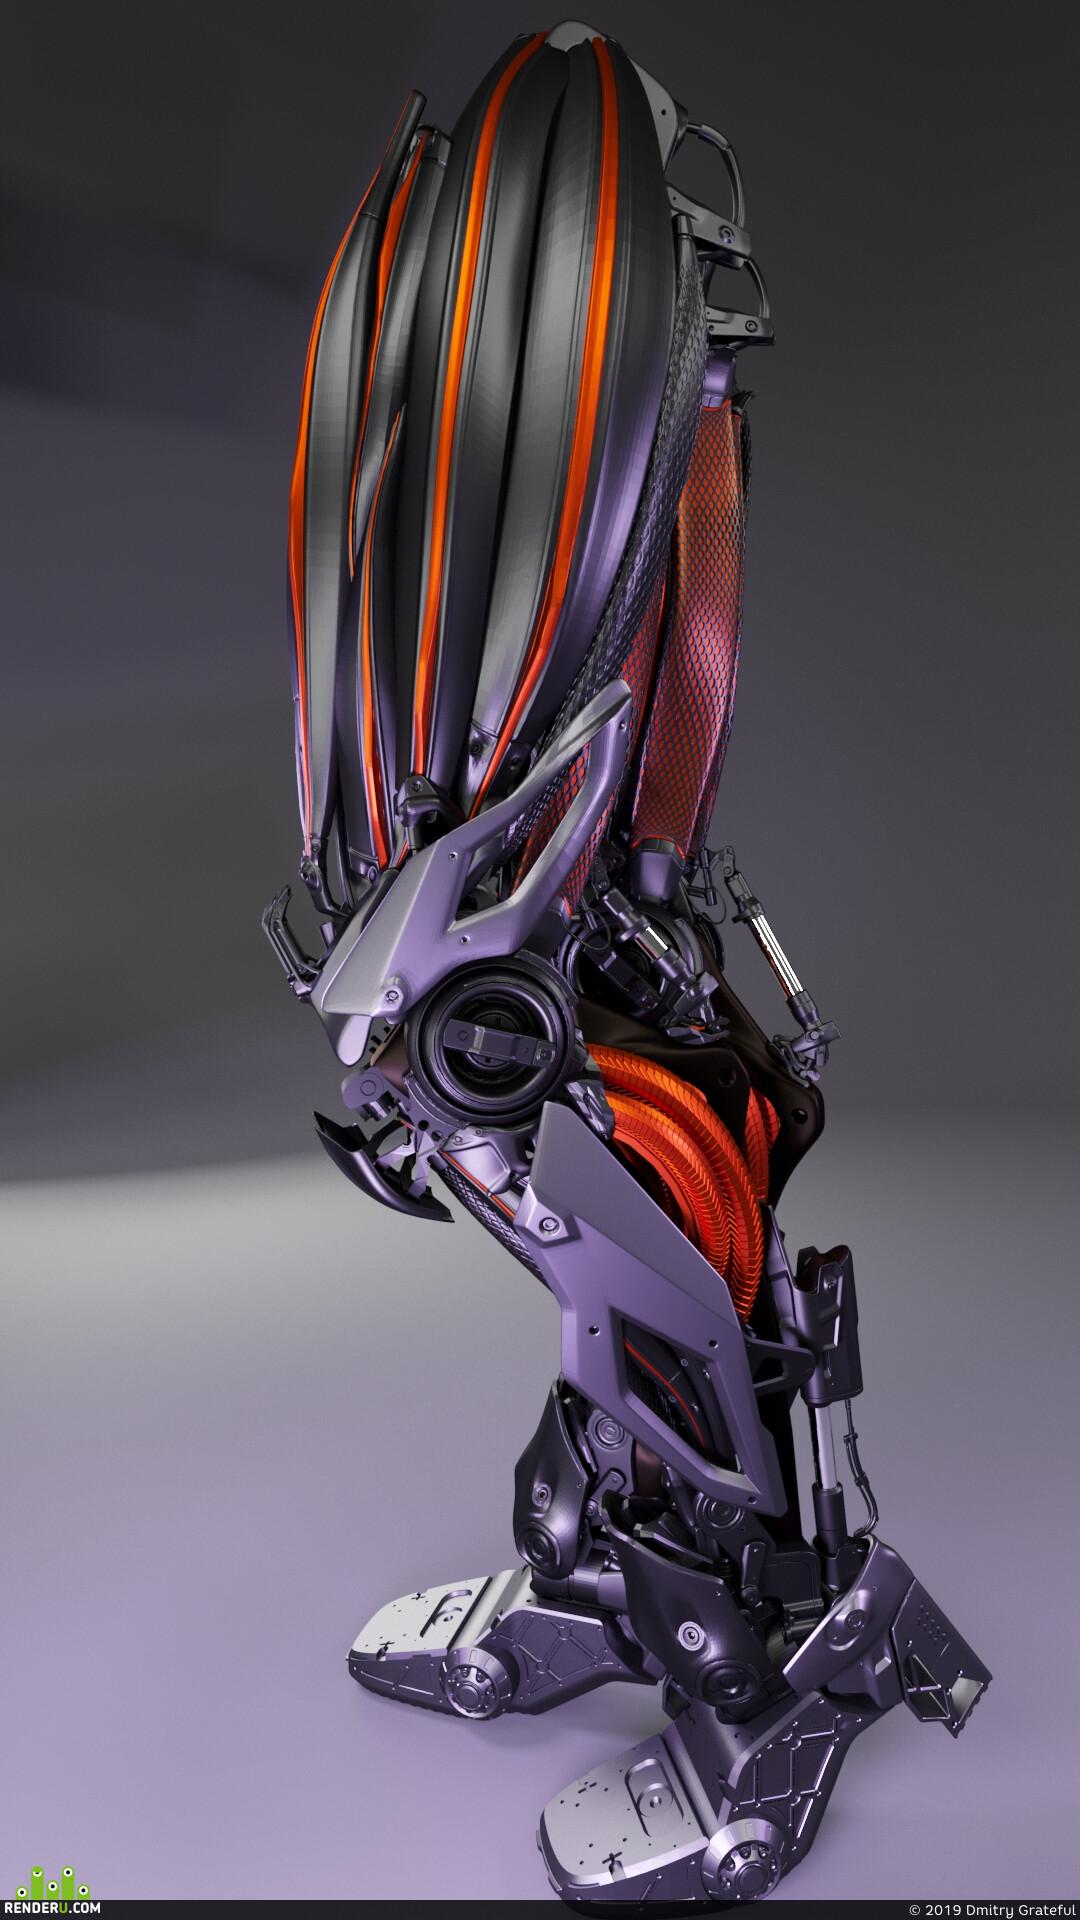 научная фантастика, Концепт Арт, концепт персонажа, дизайн персонажа, будущее